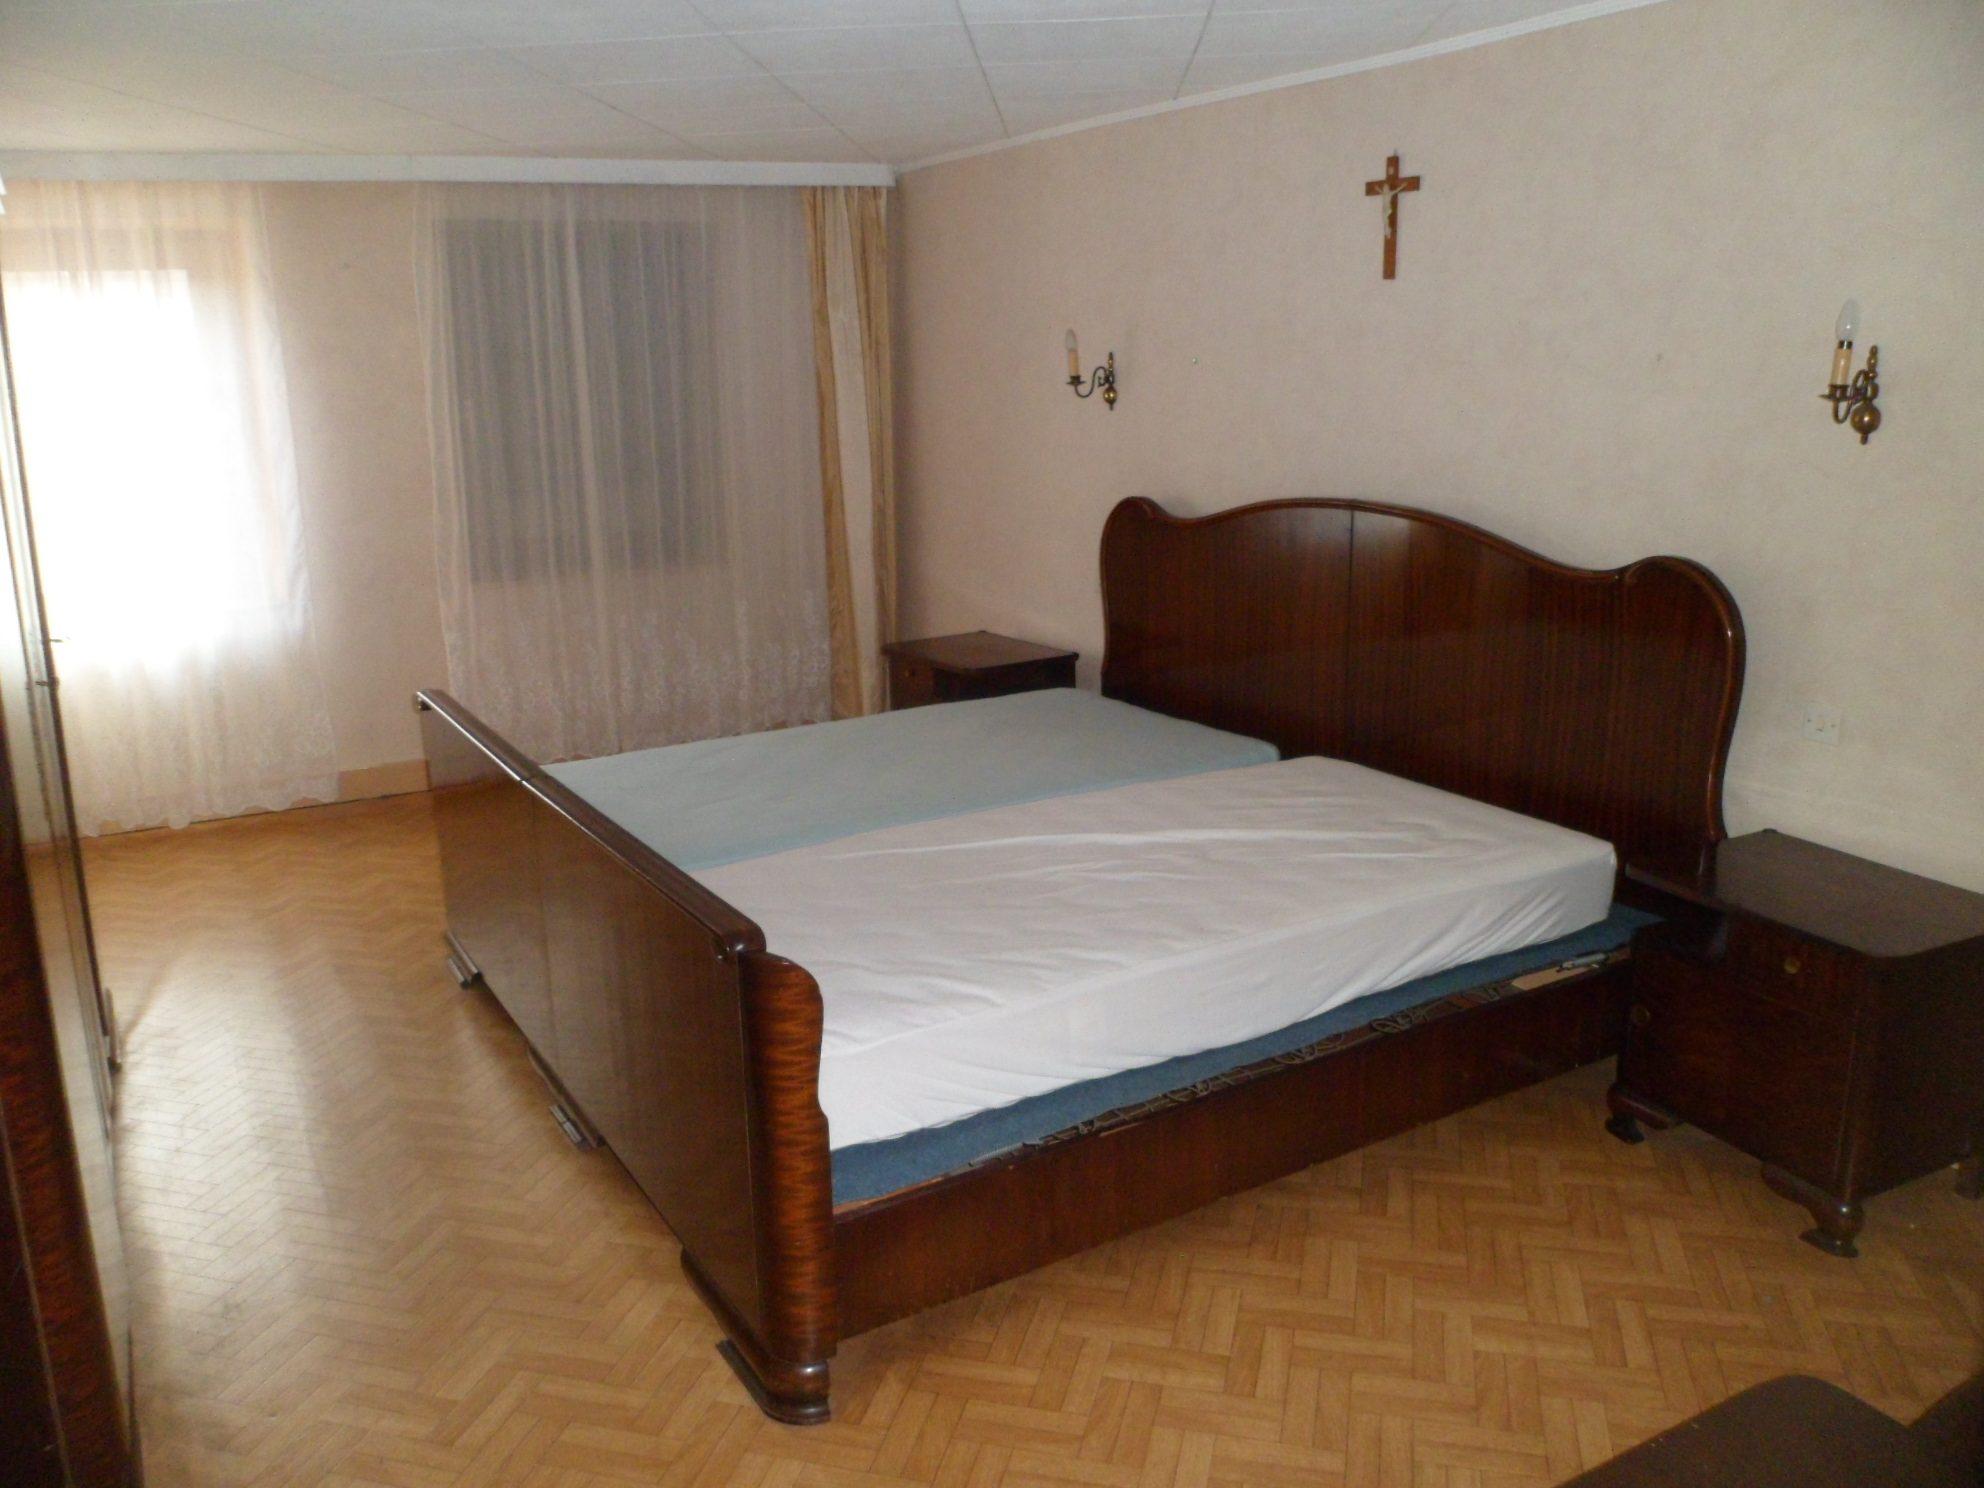 maison proche de la nature hartzviller. Black Bedroom Furniture Sets. Home Design Ideas